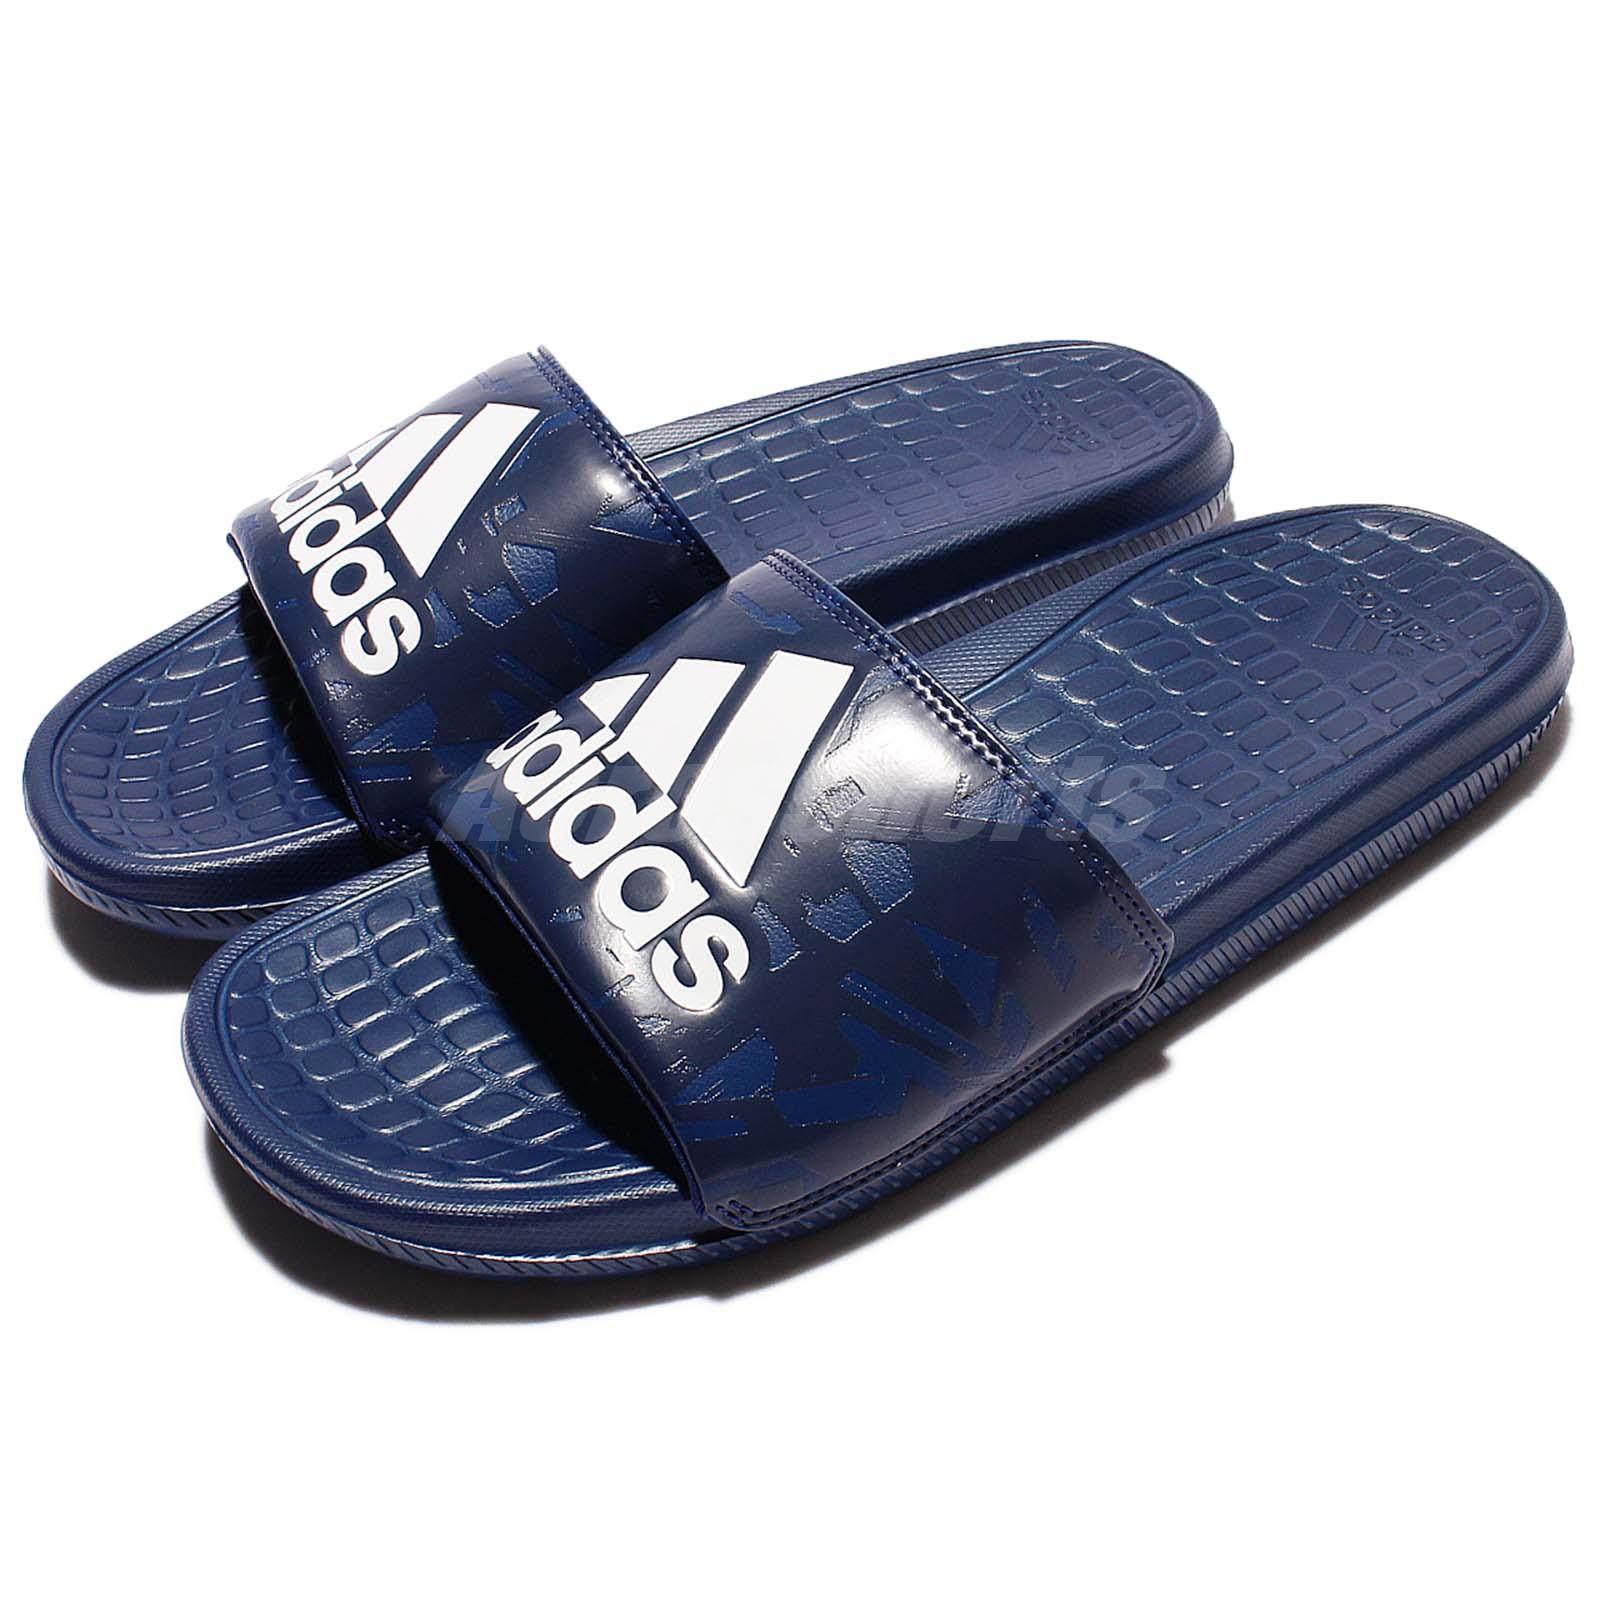 aaaeef55d502 Details about adidas Performance Voloomix GR Blue Navy White Men Sandal  Slipper Slides BA8858